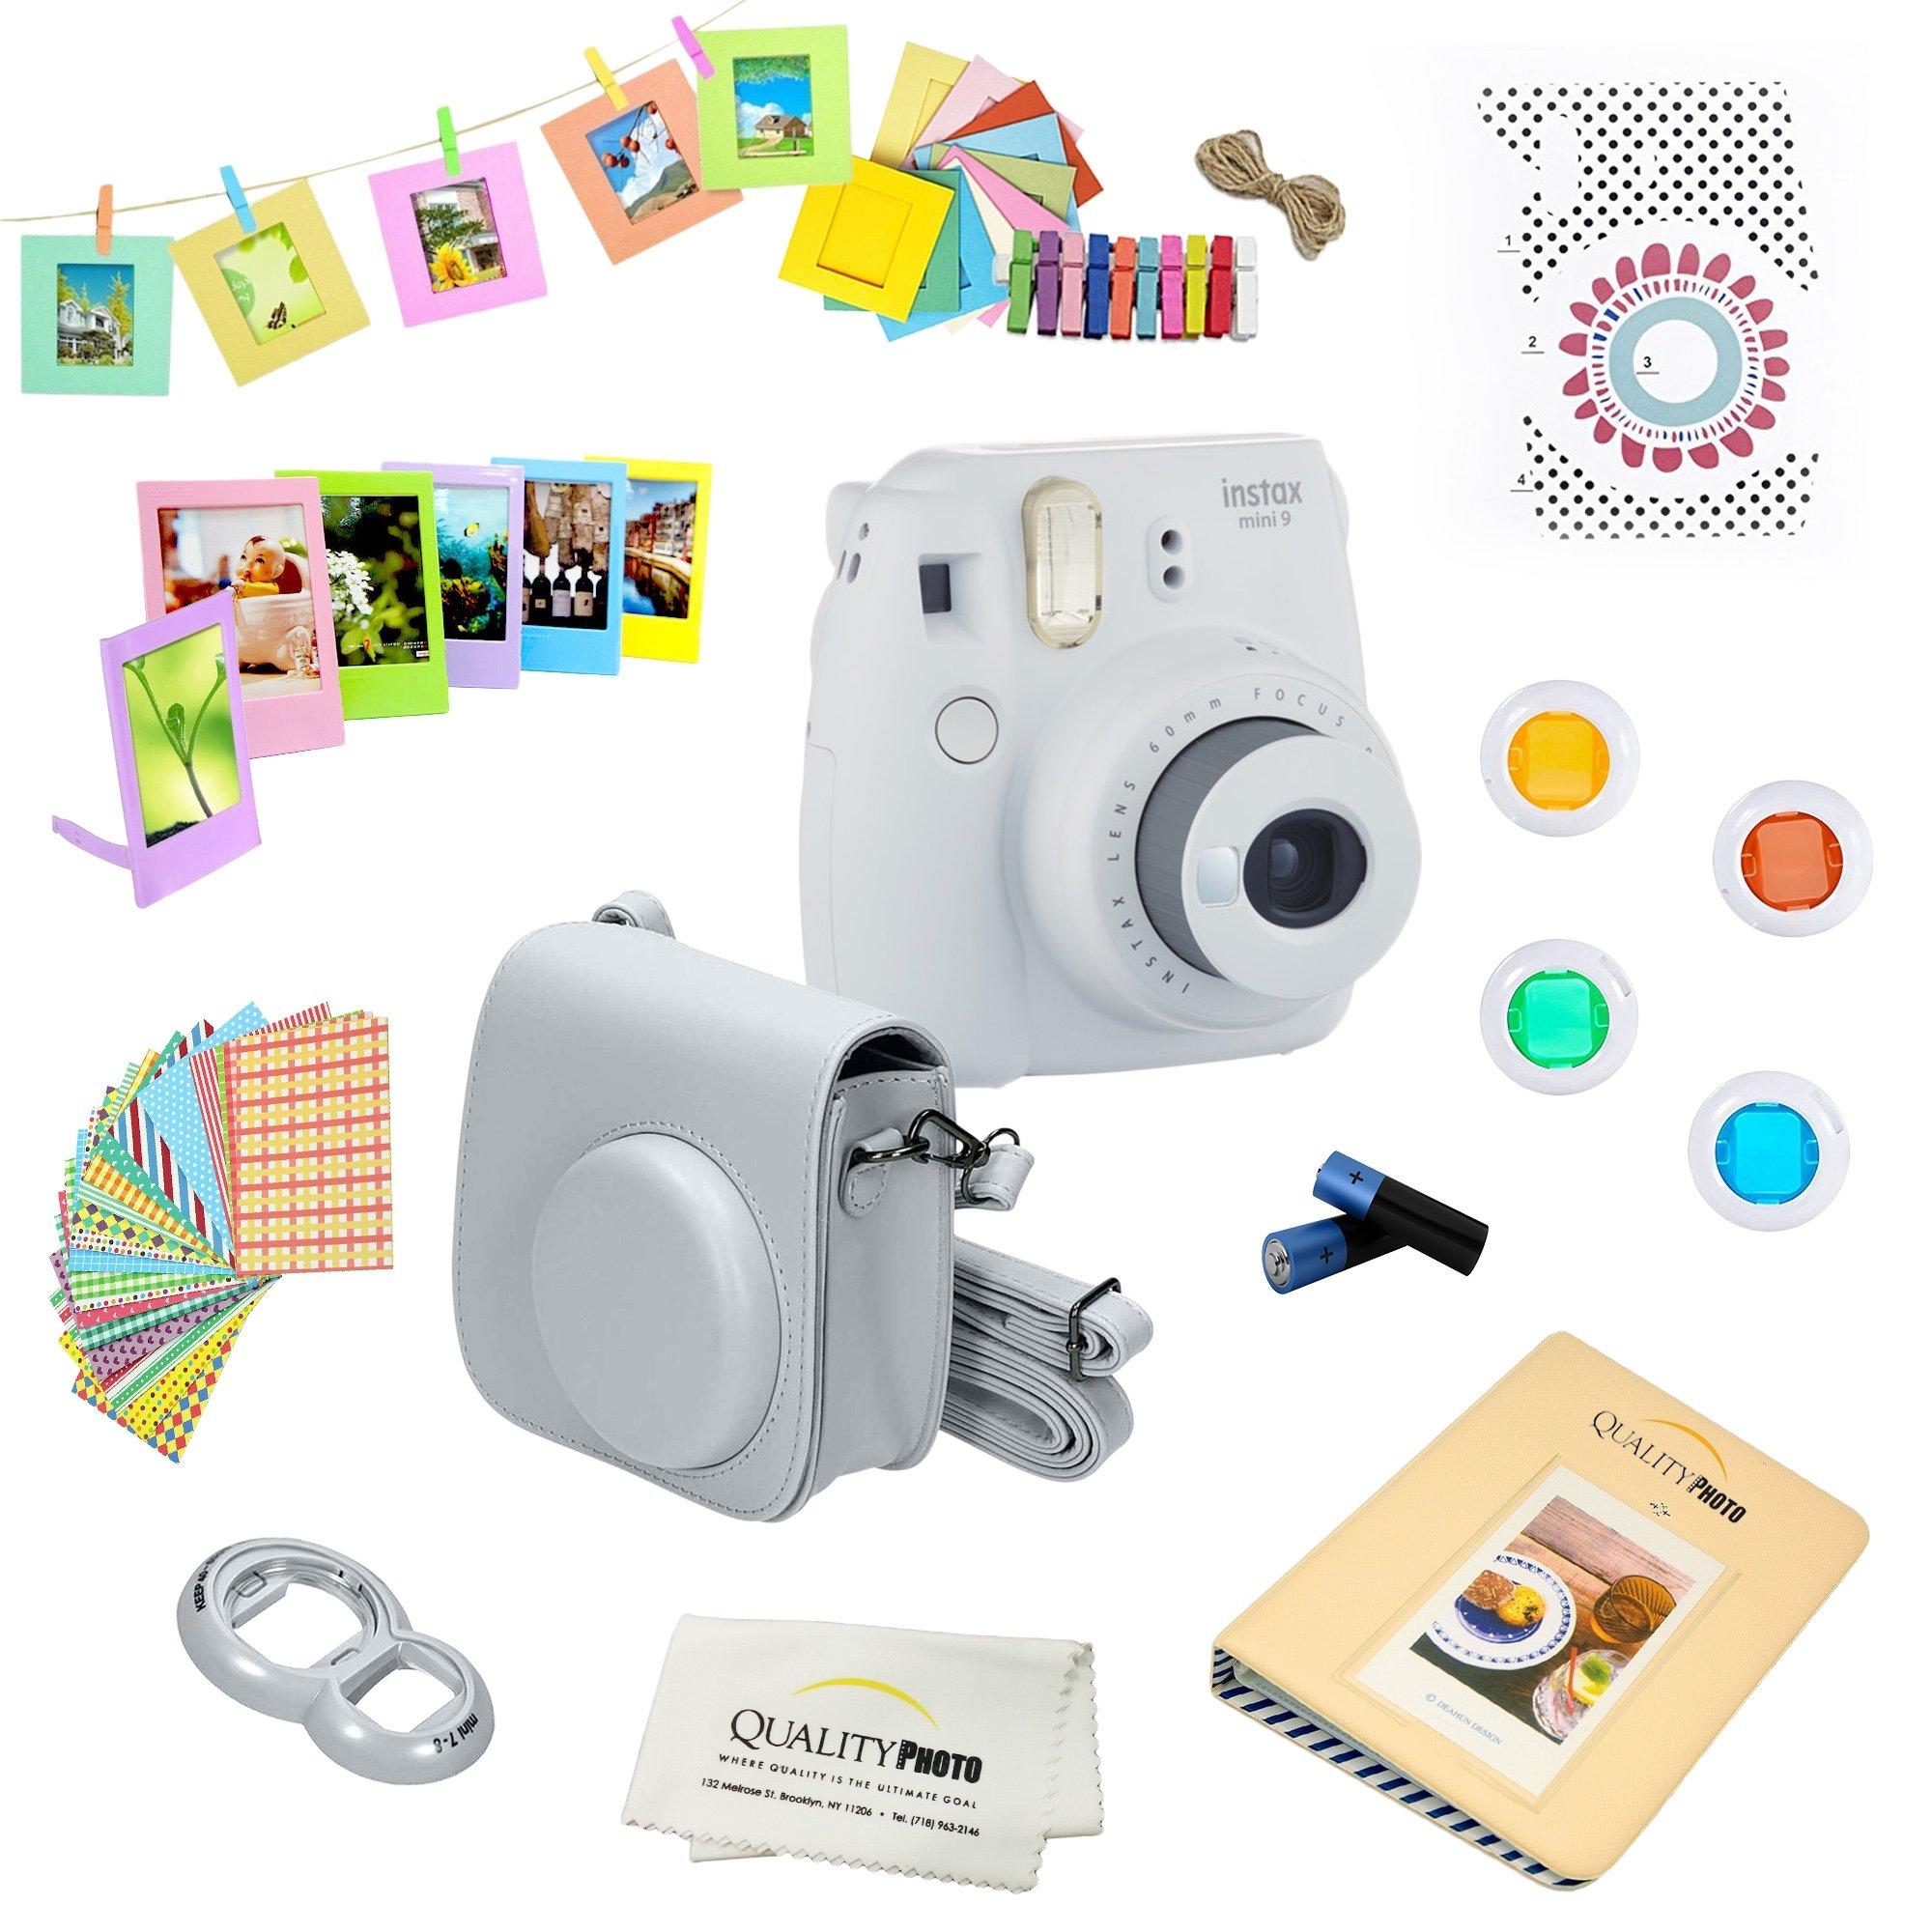 Fujifilm Instax Mini 9 Camera + 14 PC Instax Accessories kit Bundle, Includes; Instax Case + Album + Frames & Stickers + Lens Filters + MORE (Smokey White) by Fujifilm